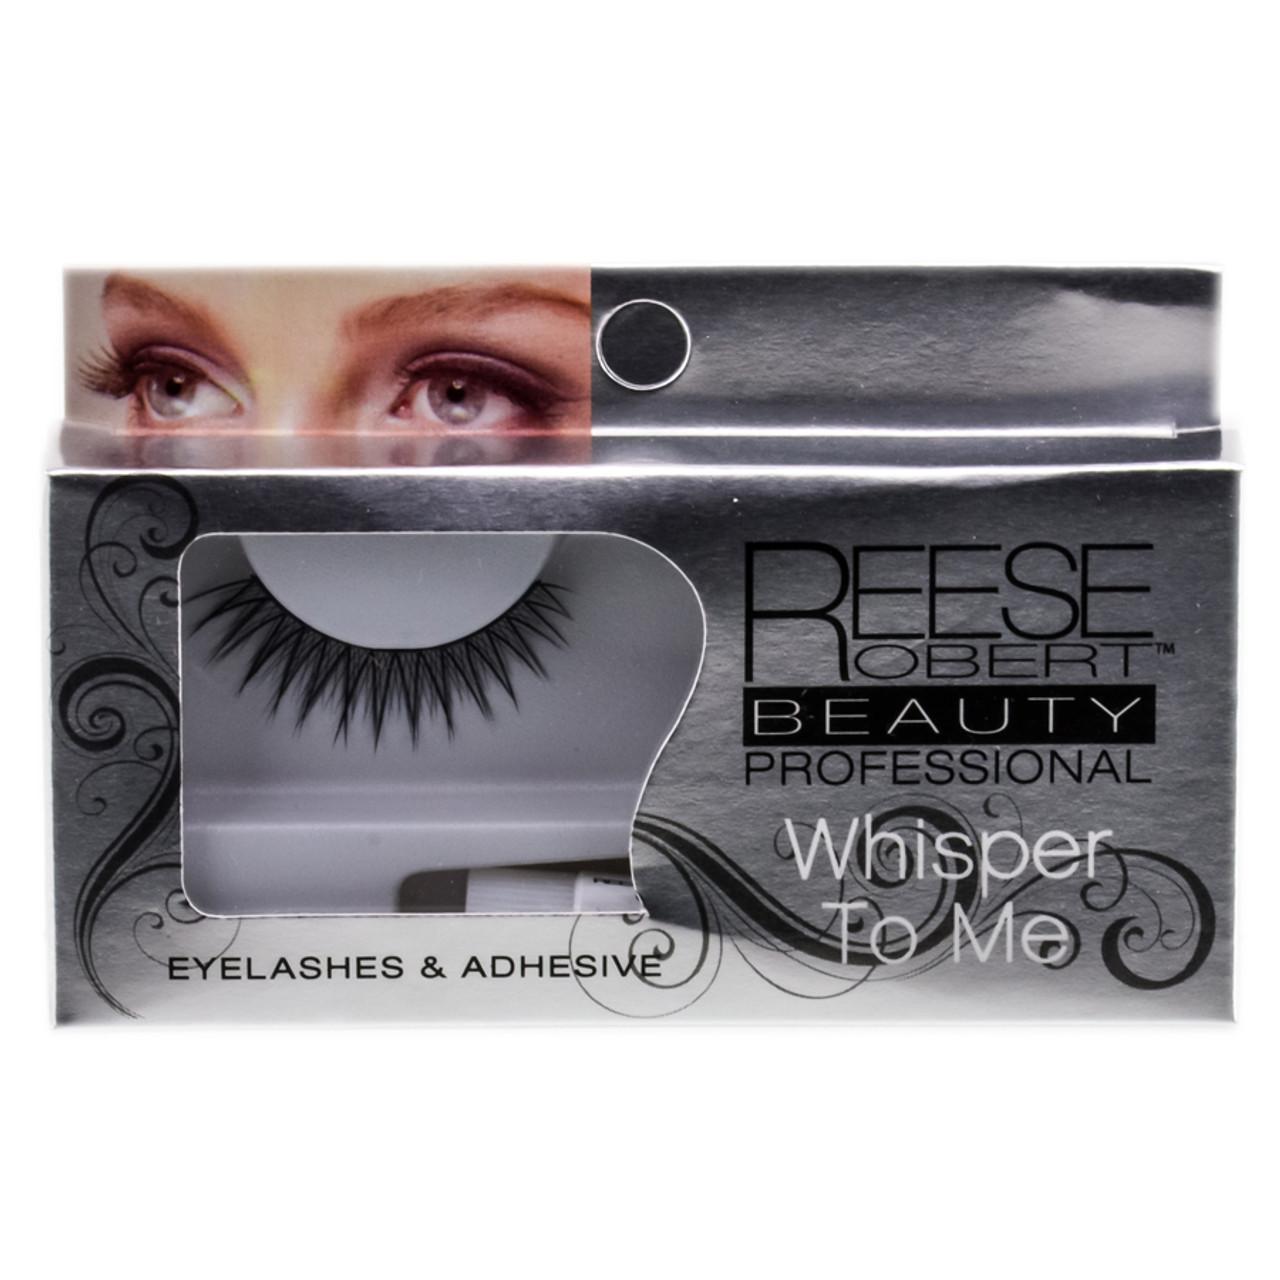 Reese Robert Beauty Professional Eyelashes Adhesive